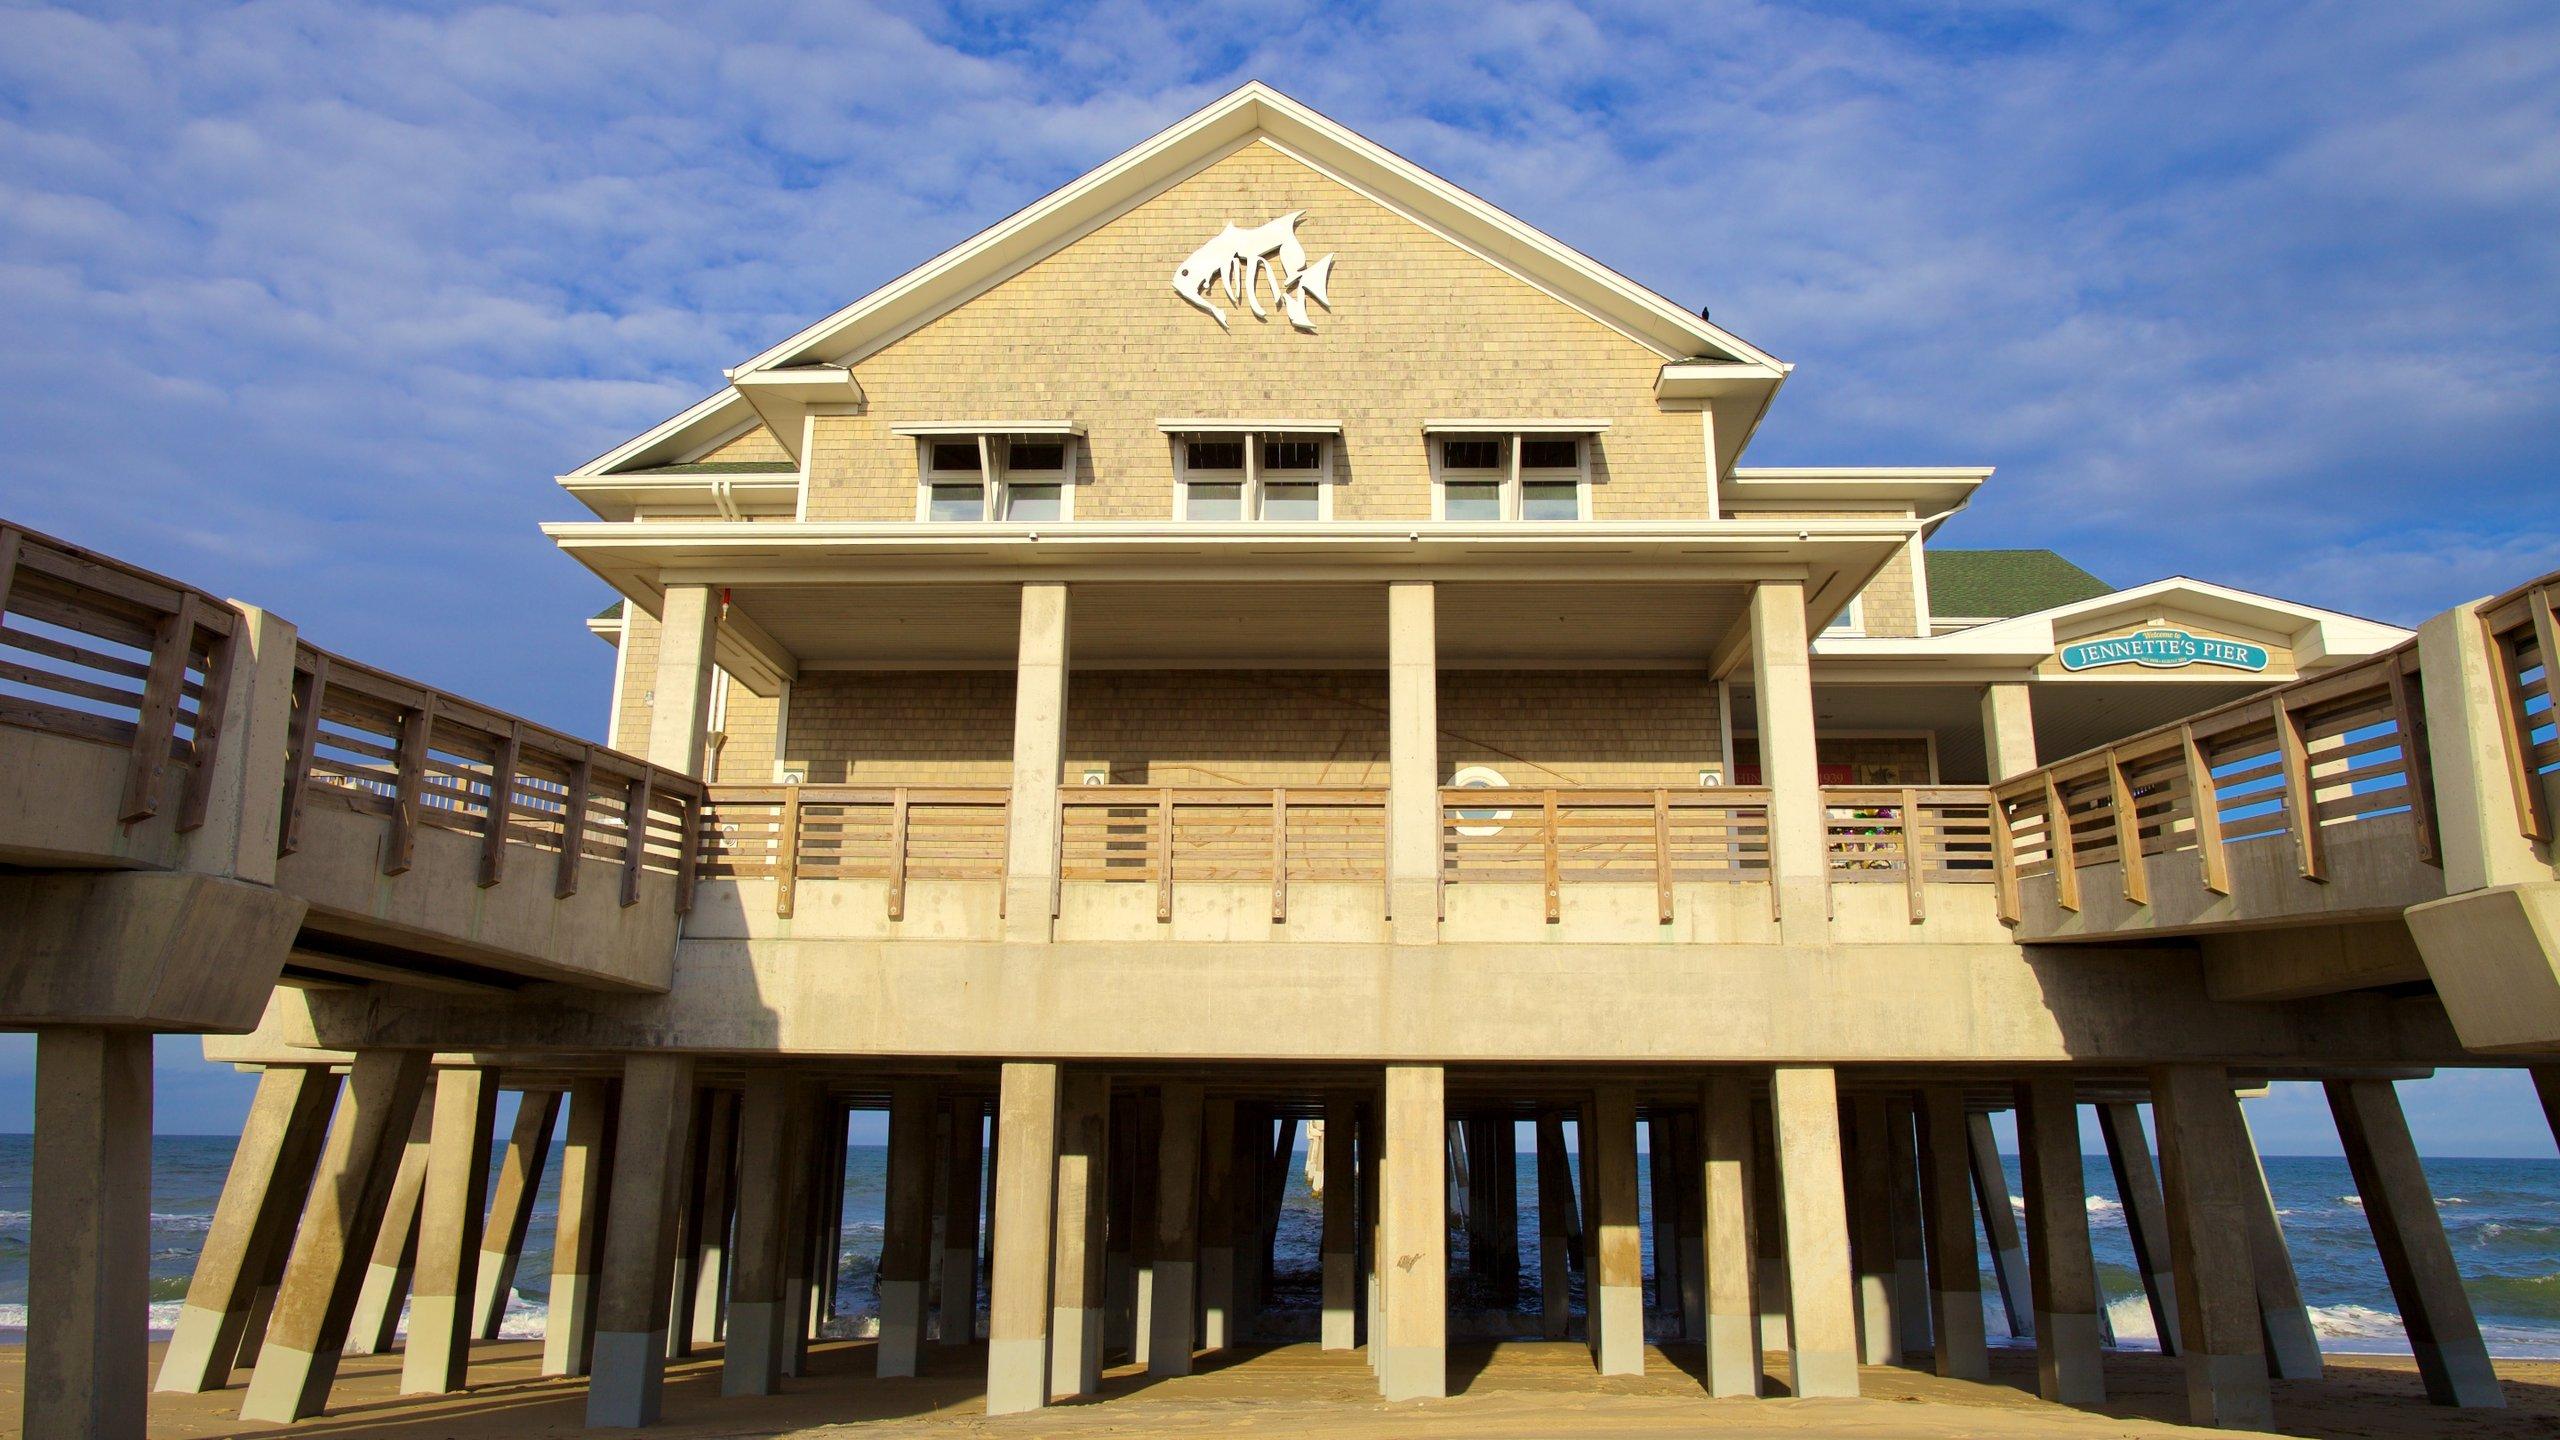 Outer Banks, North Carolina, United States of America